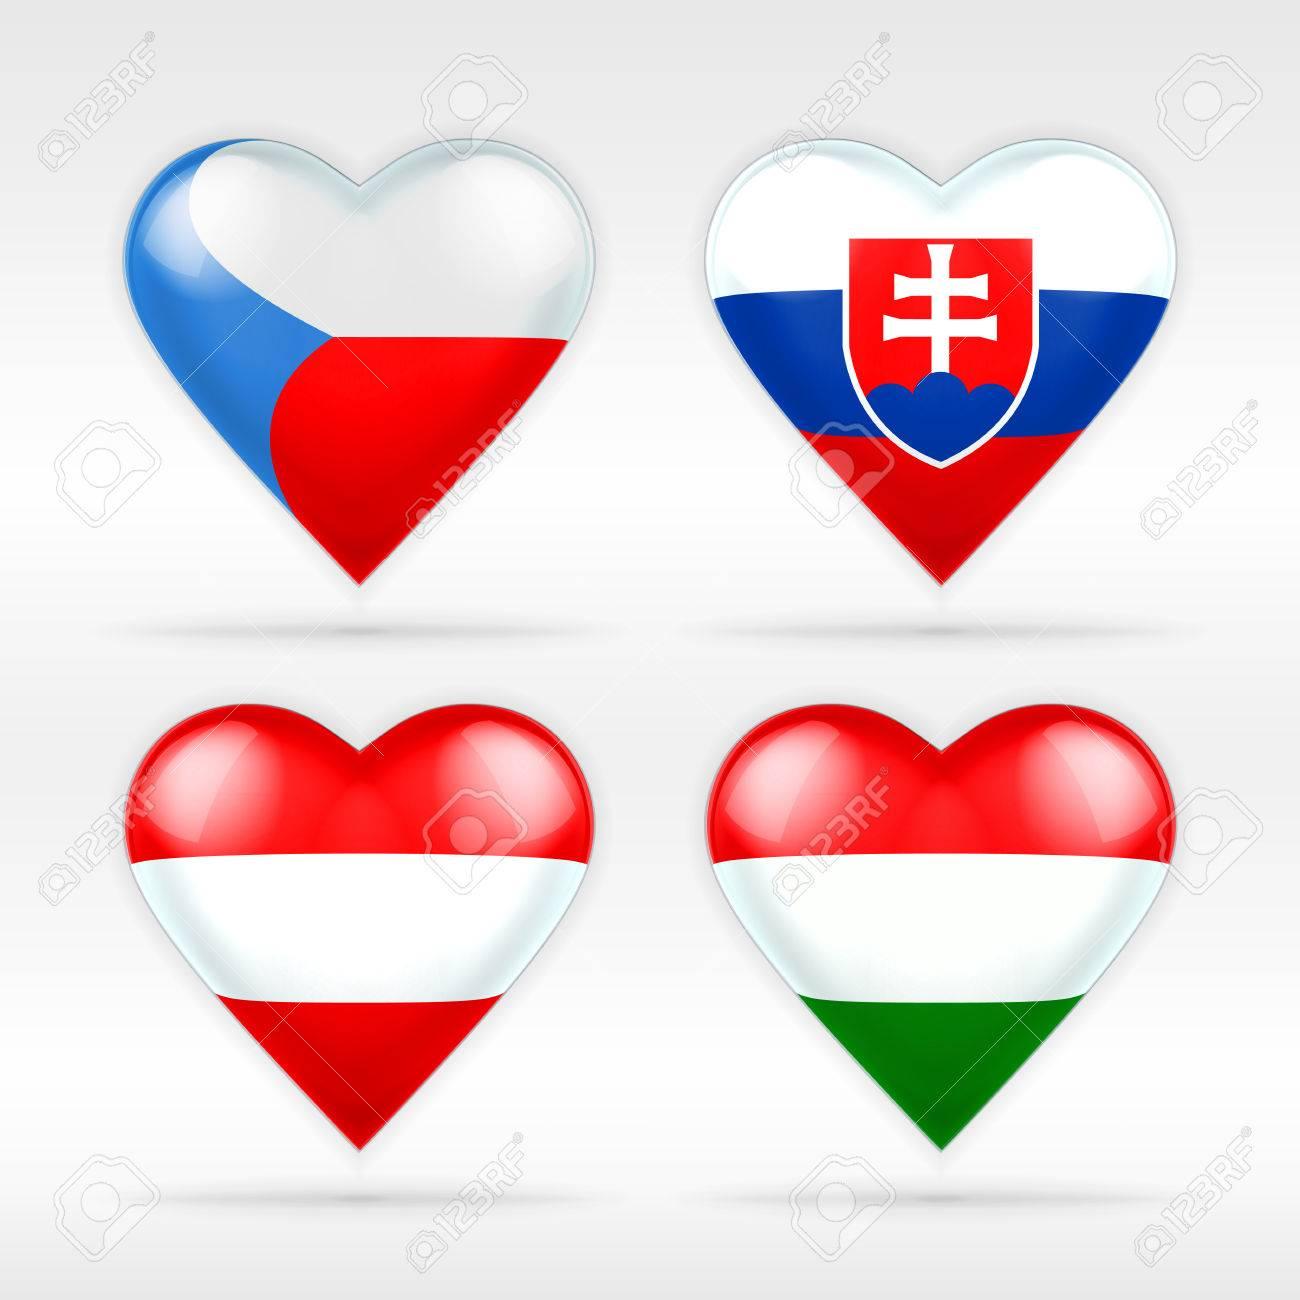 Czech, Slovakia, Austria And Hungary Heart Flag Set Of European ...